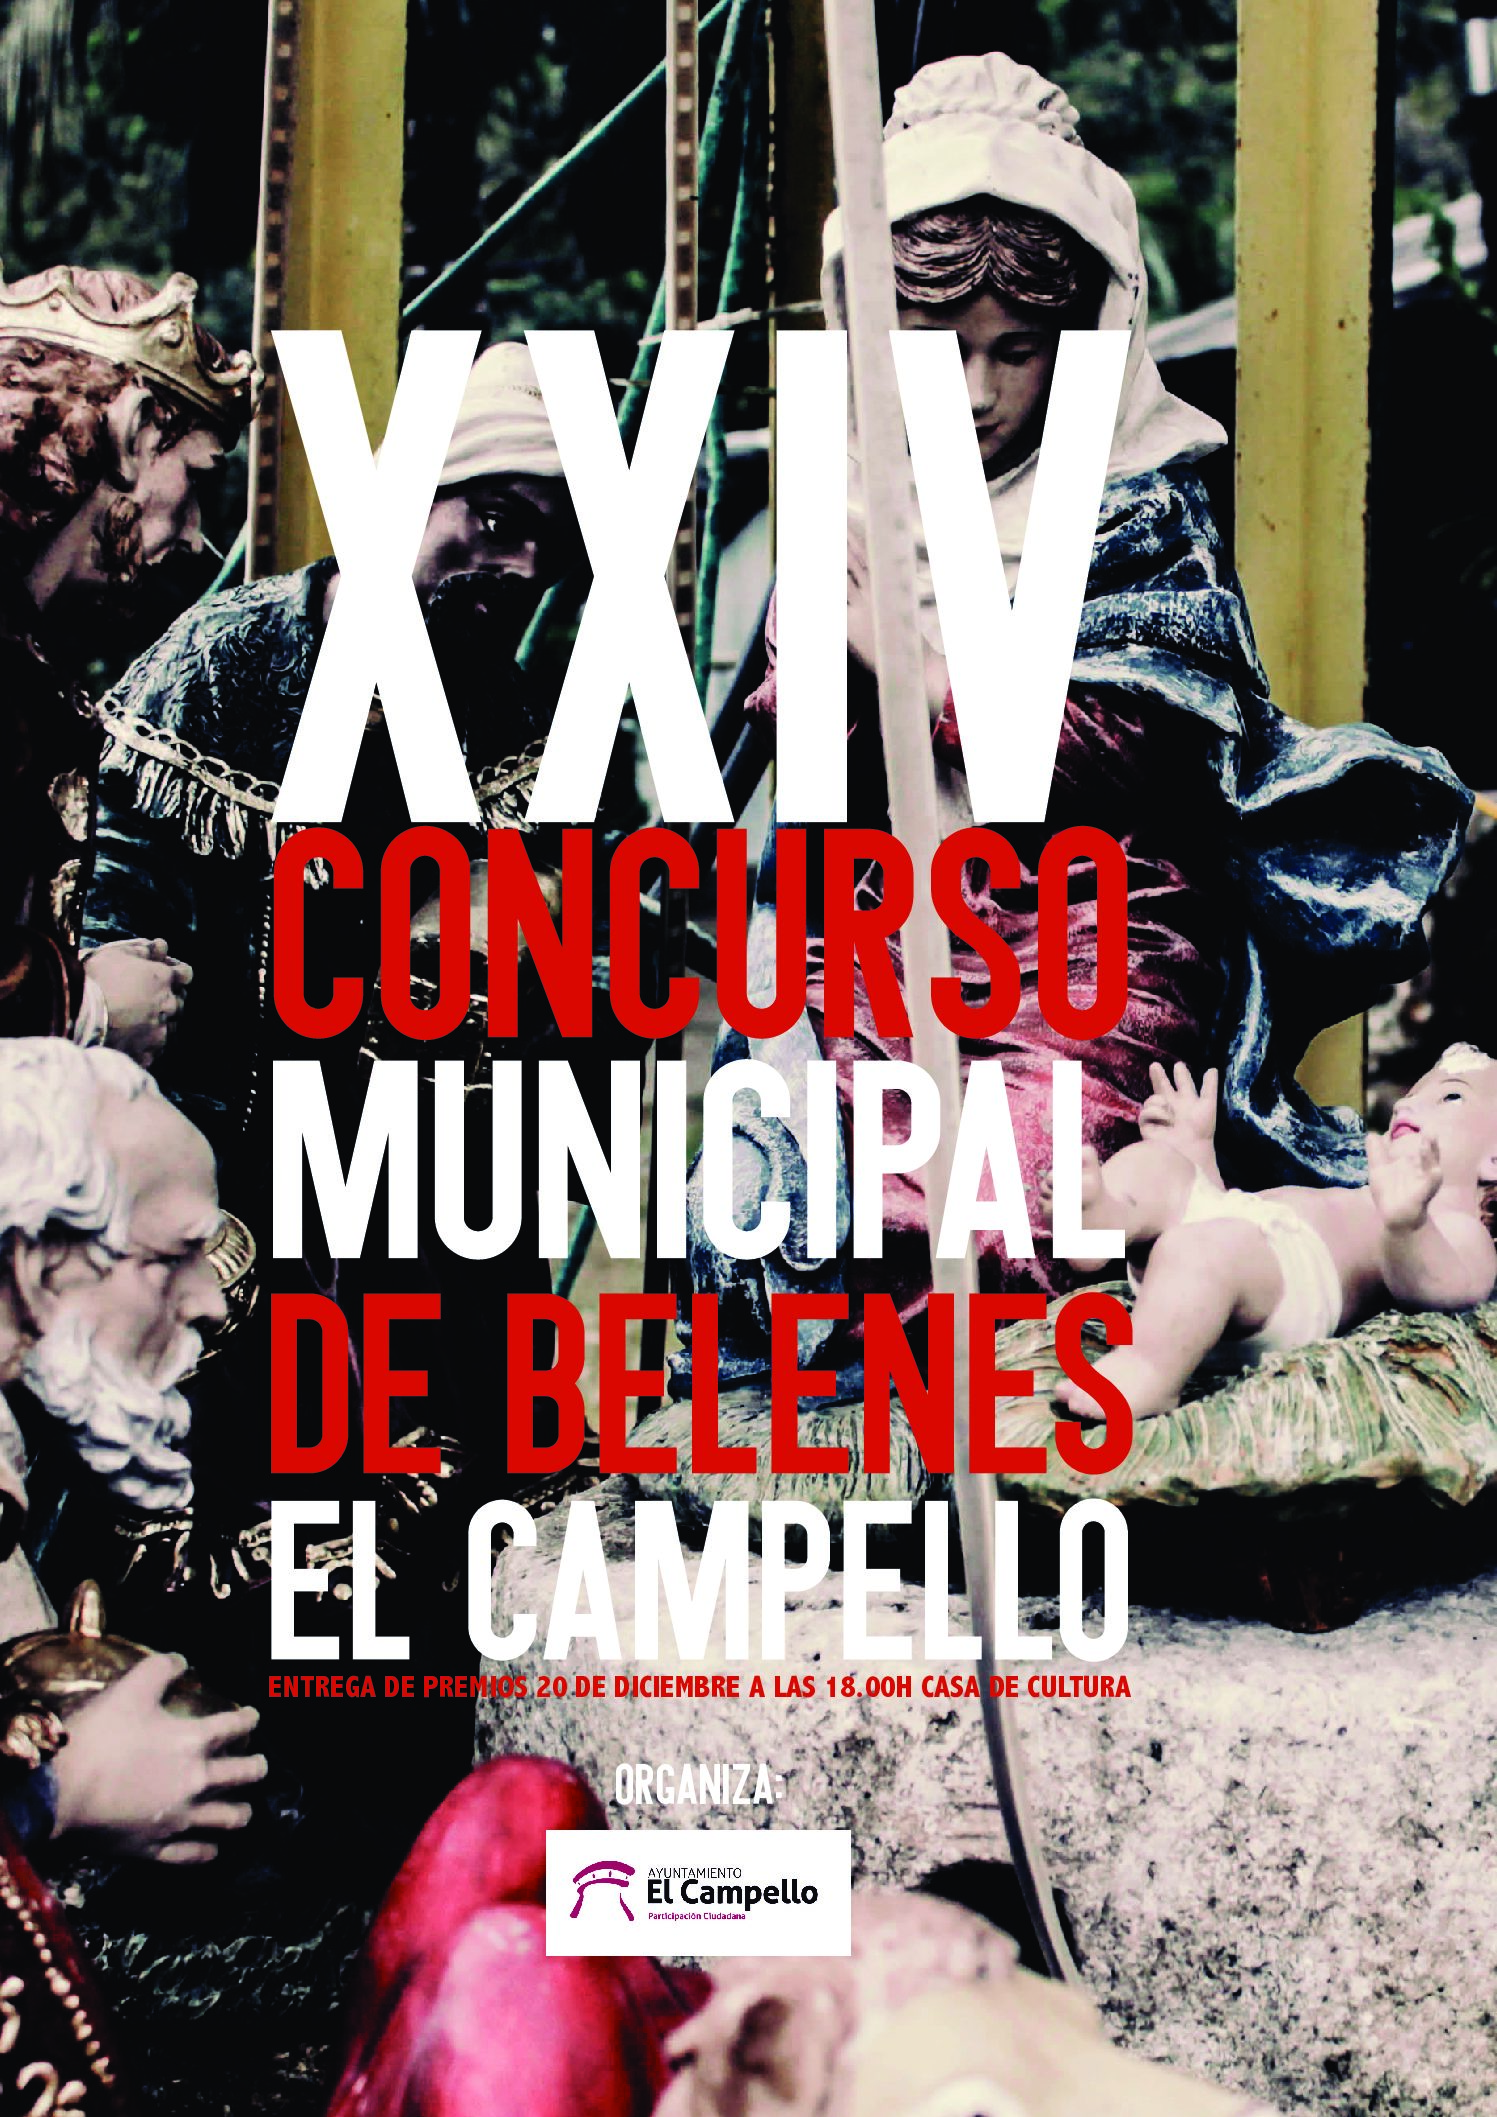 XXIV CONCURSO MUNICIPAL DE BELENES